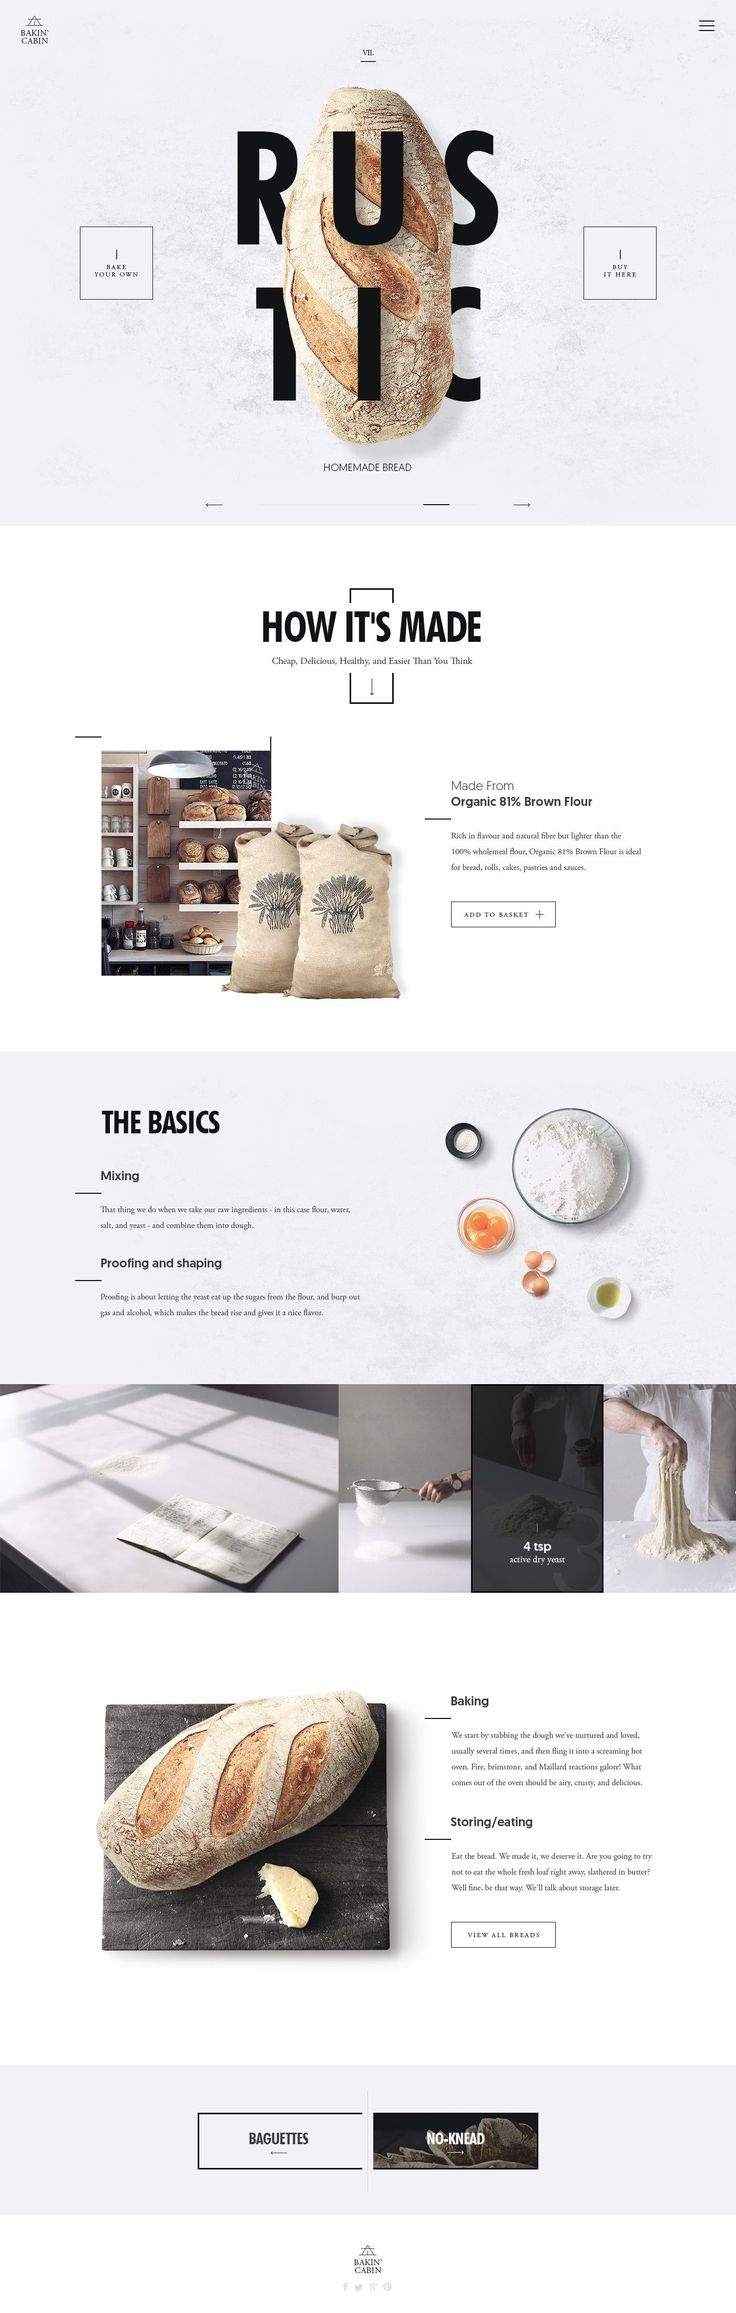 Bakin' Cabin layout on Inspirationde #WebDesign #ResponsiveWebDesign